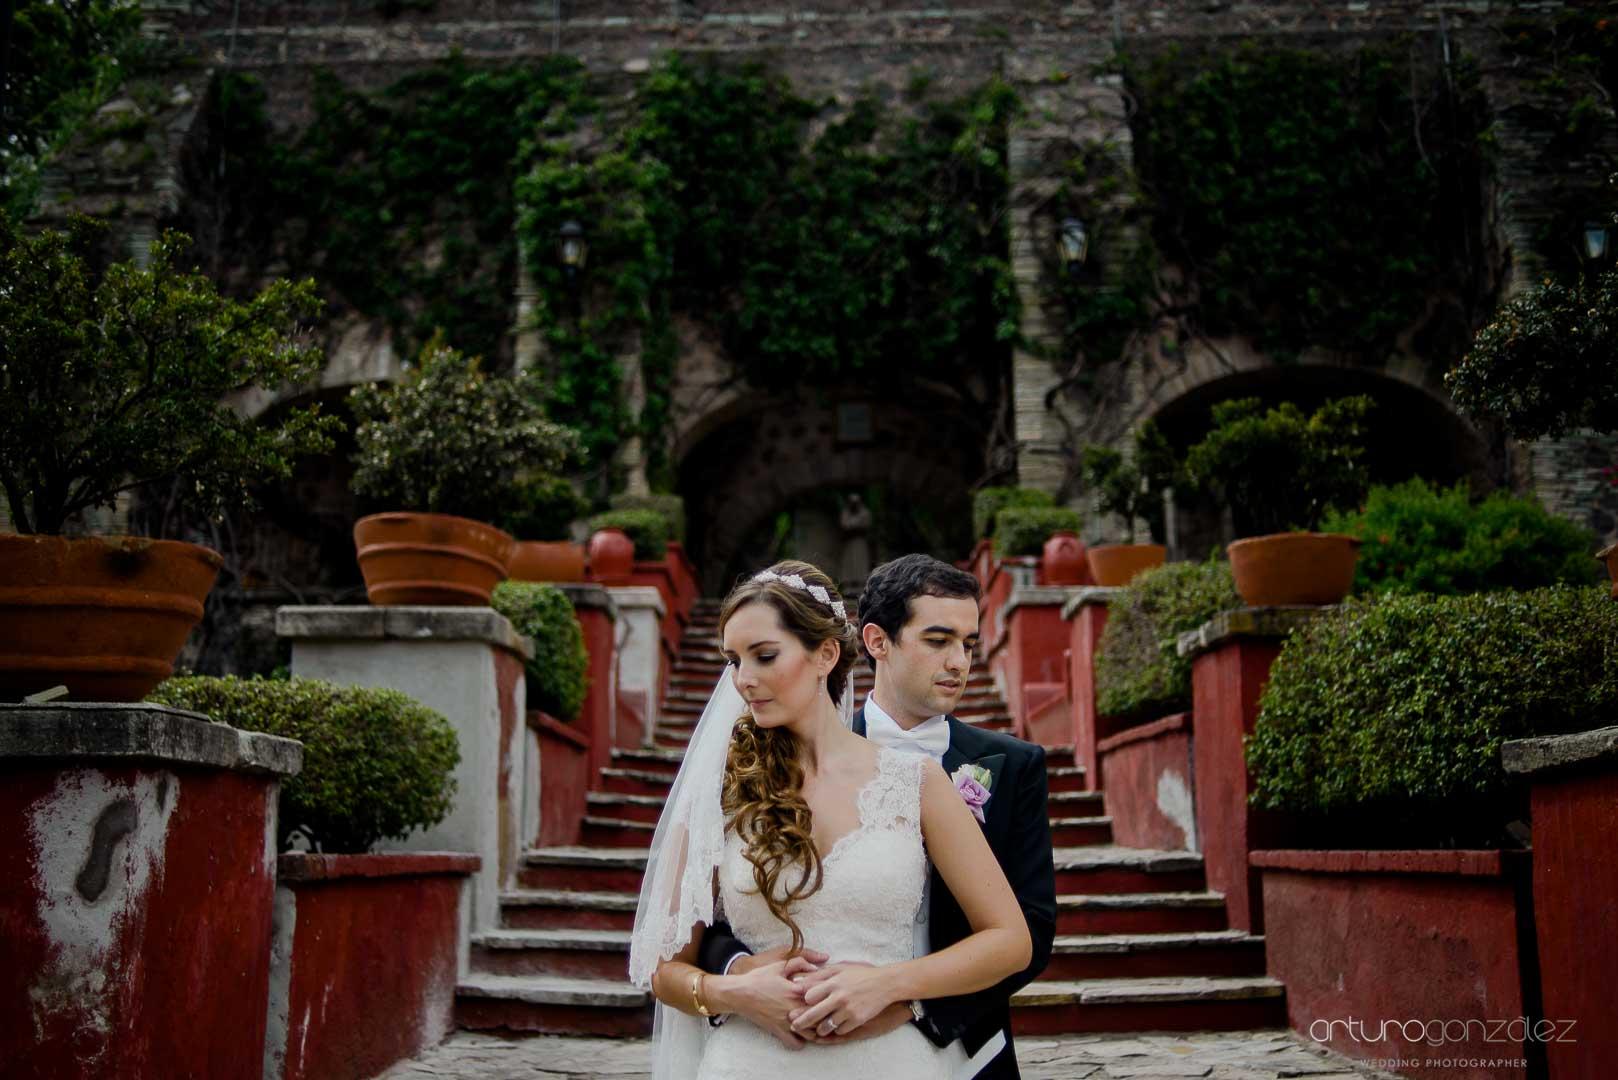 fotografo-de-bodas-en-guanajuato-41